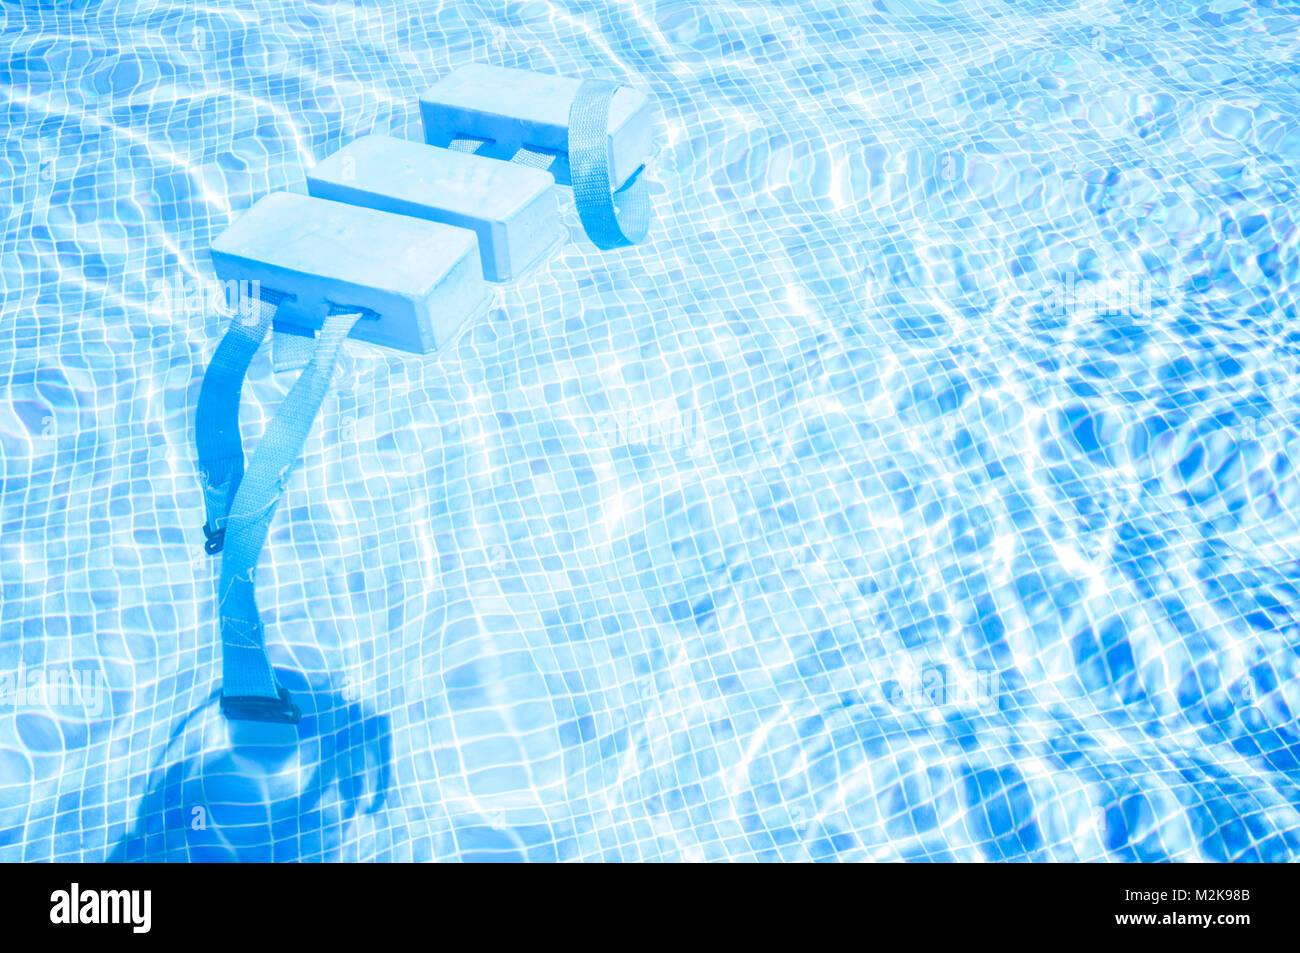 Swimming Float Belt for Kids Swim Training on swimming pool surface. Swiming pool bottom made of gresite - Stock Image